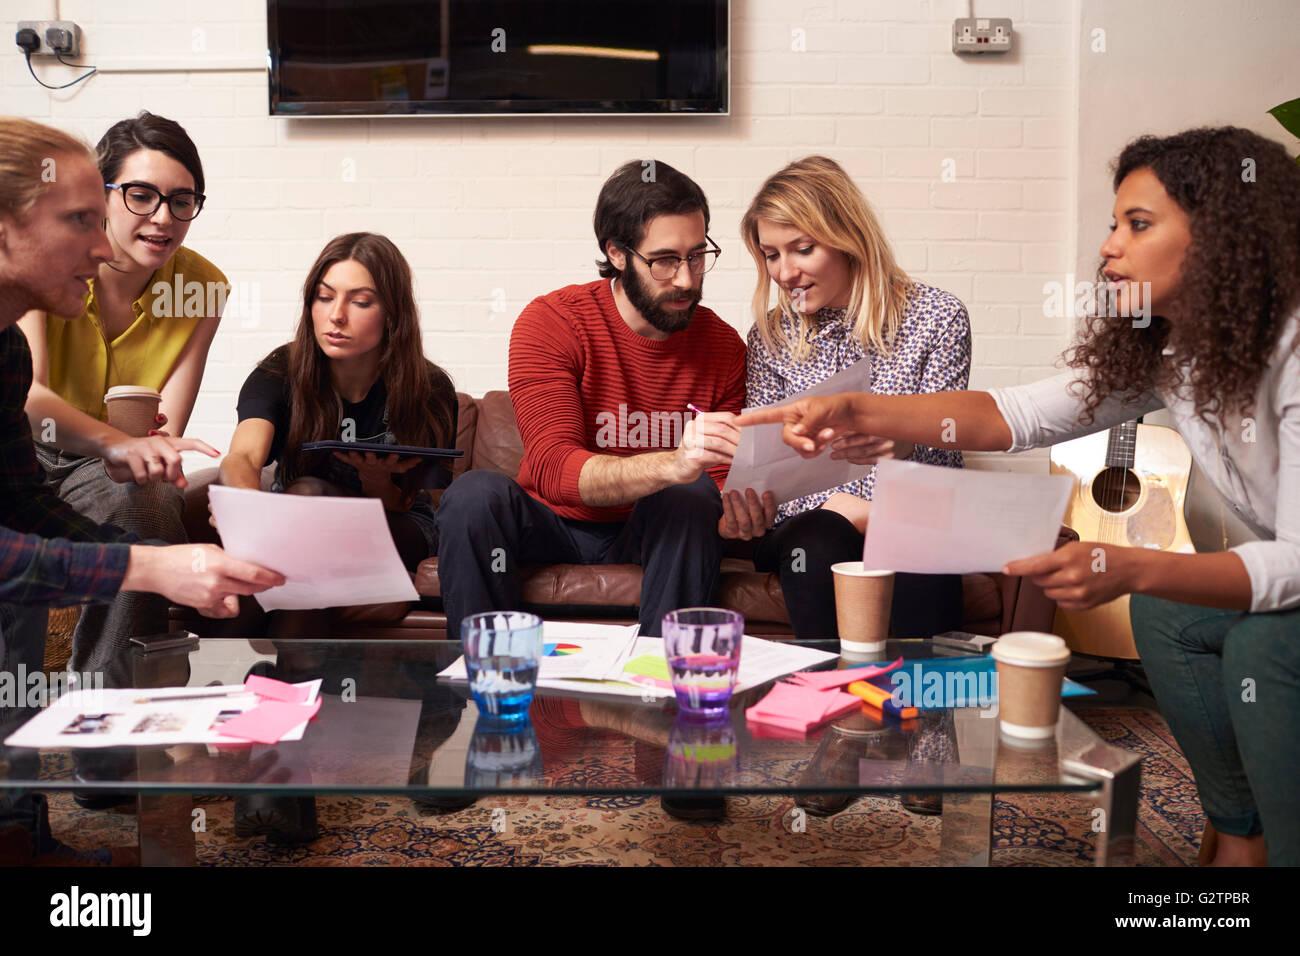 Designers Sitting On Sofa Having Creative Meeting In Office - Stock Image